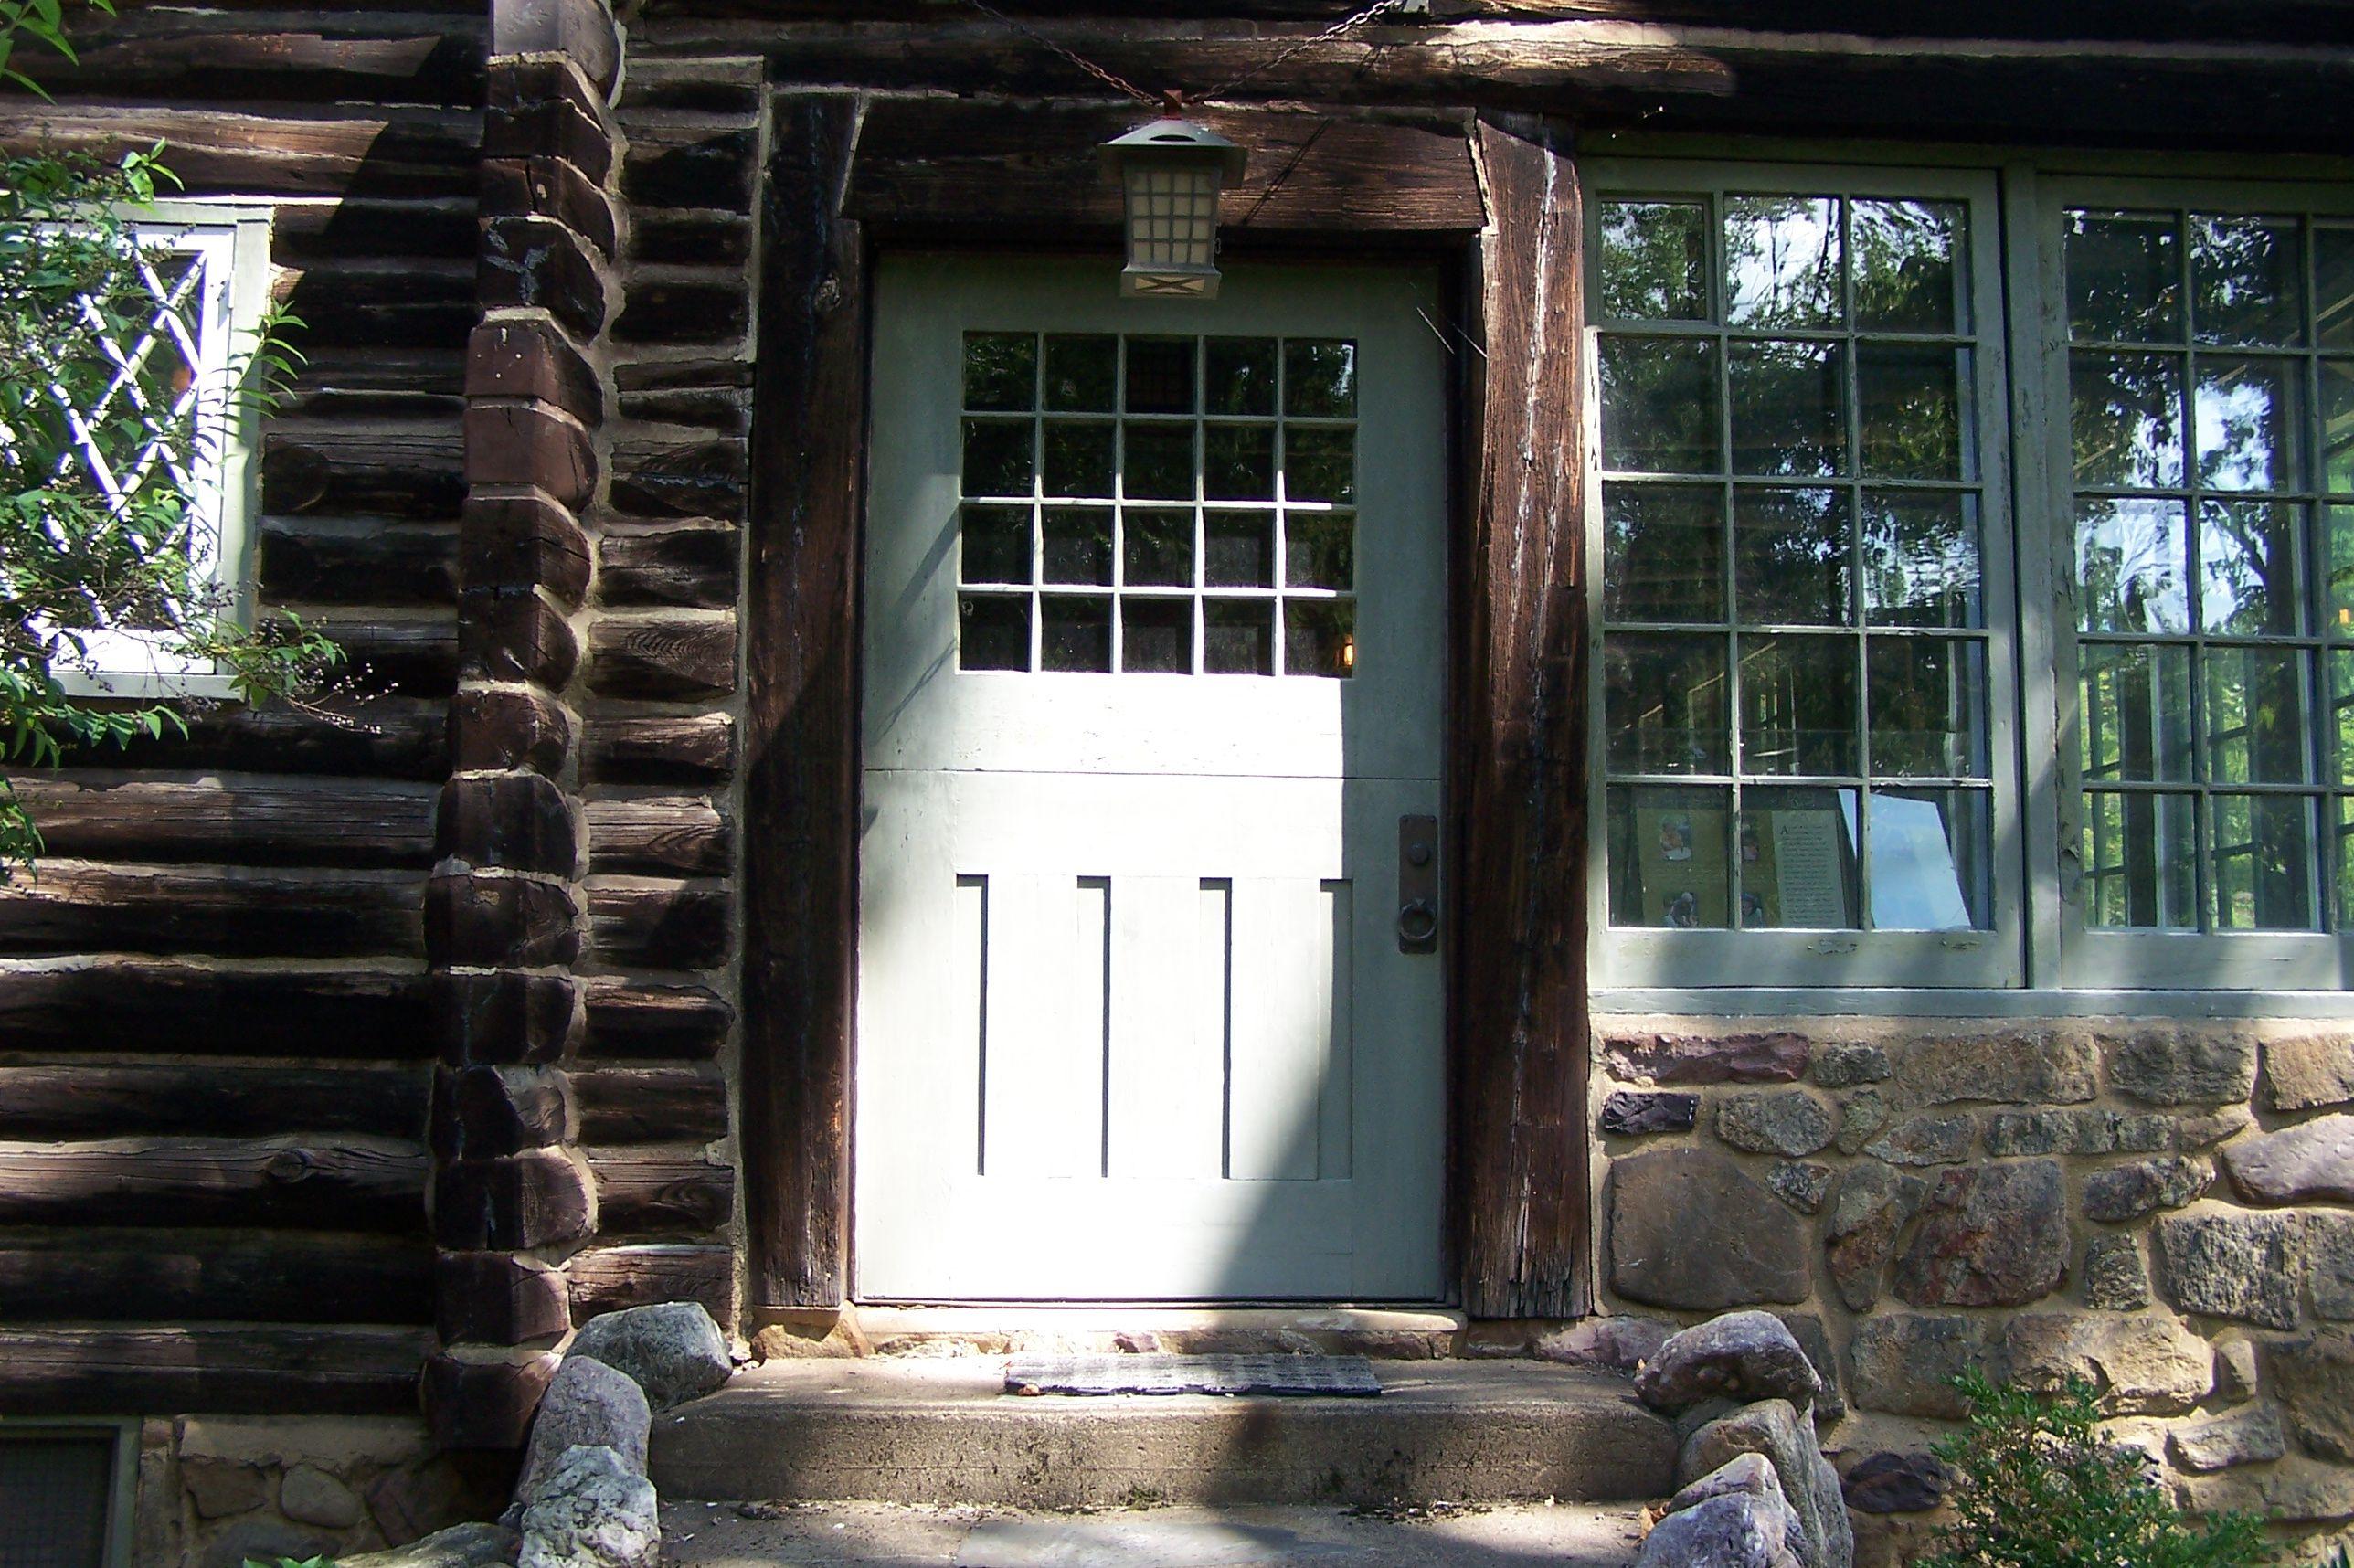 Craftsman Farms Log House Door Detail, Home of Gustav Stickley 1908-1917, in Morris Plains, New Jersey